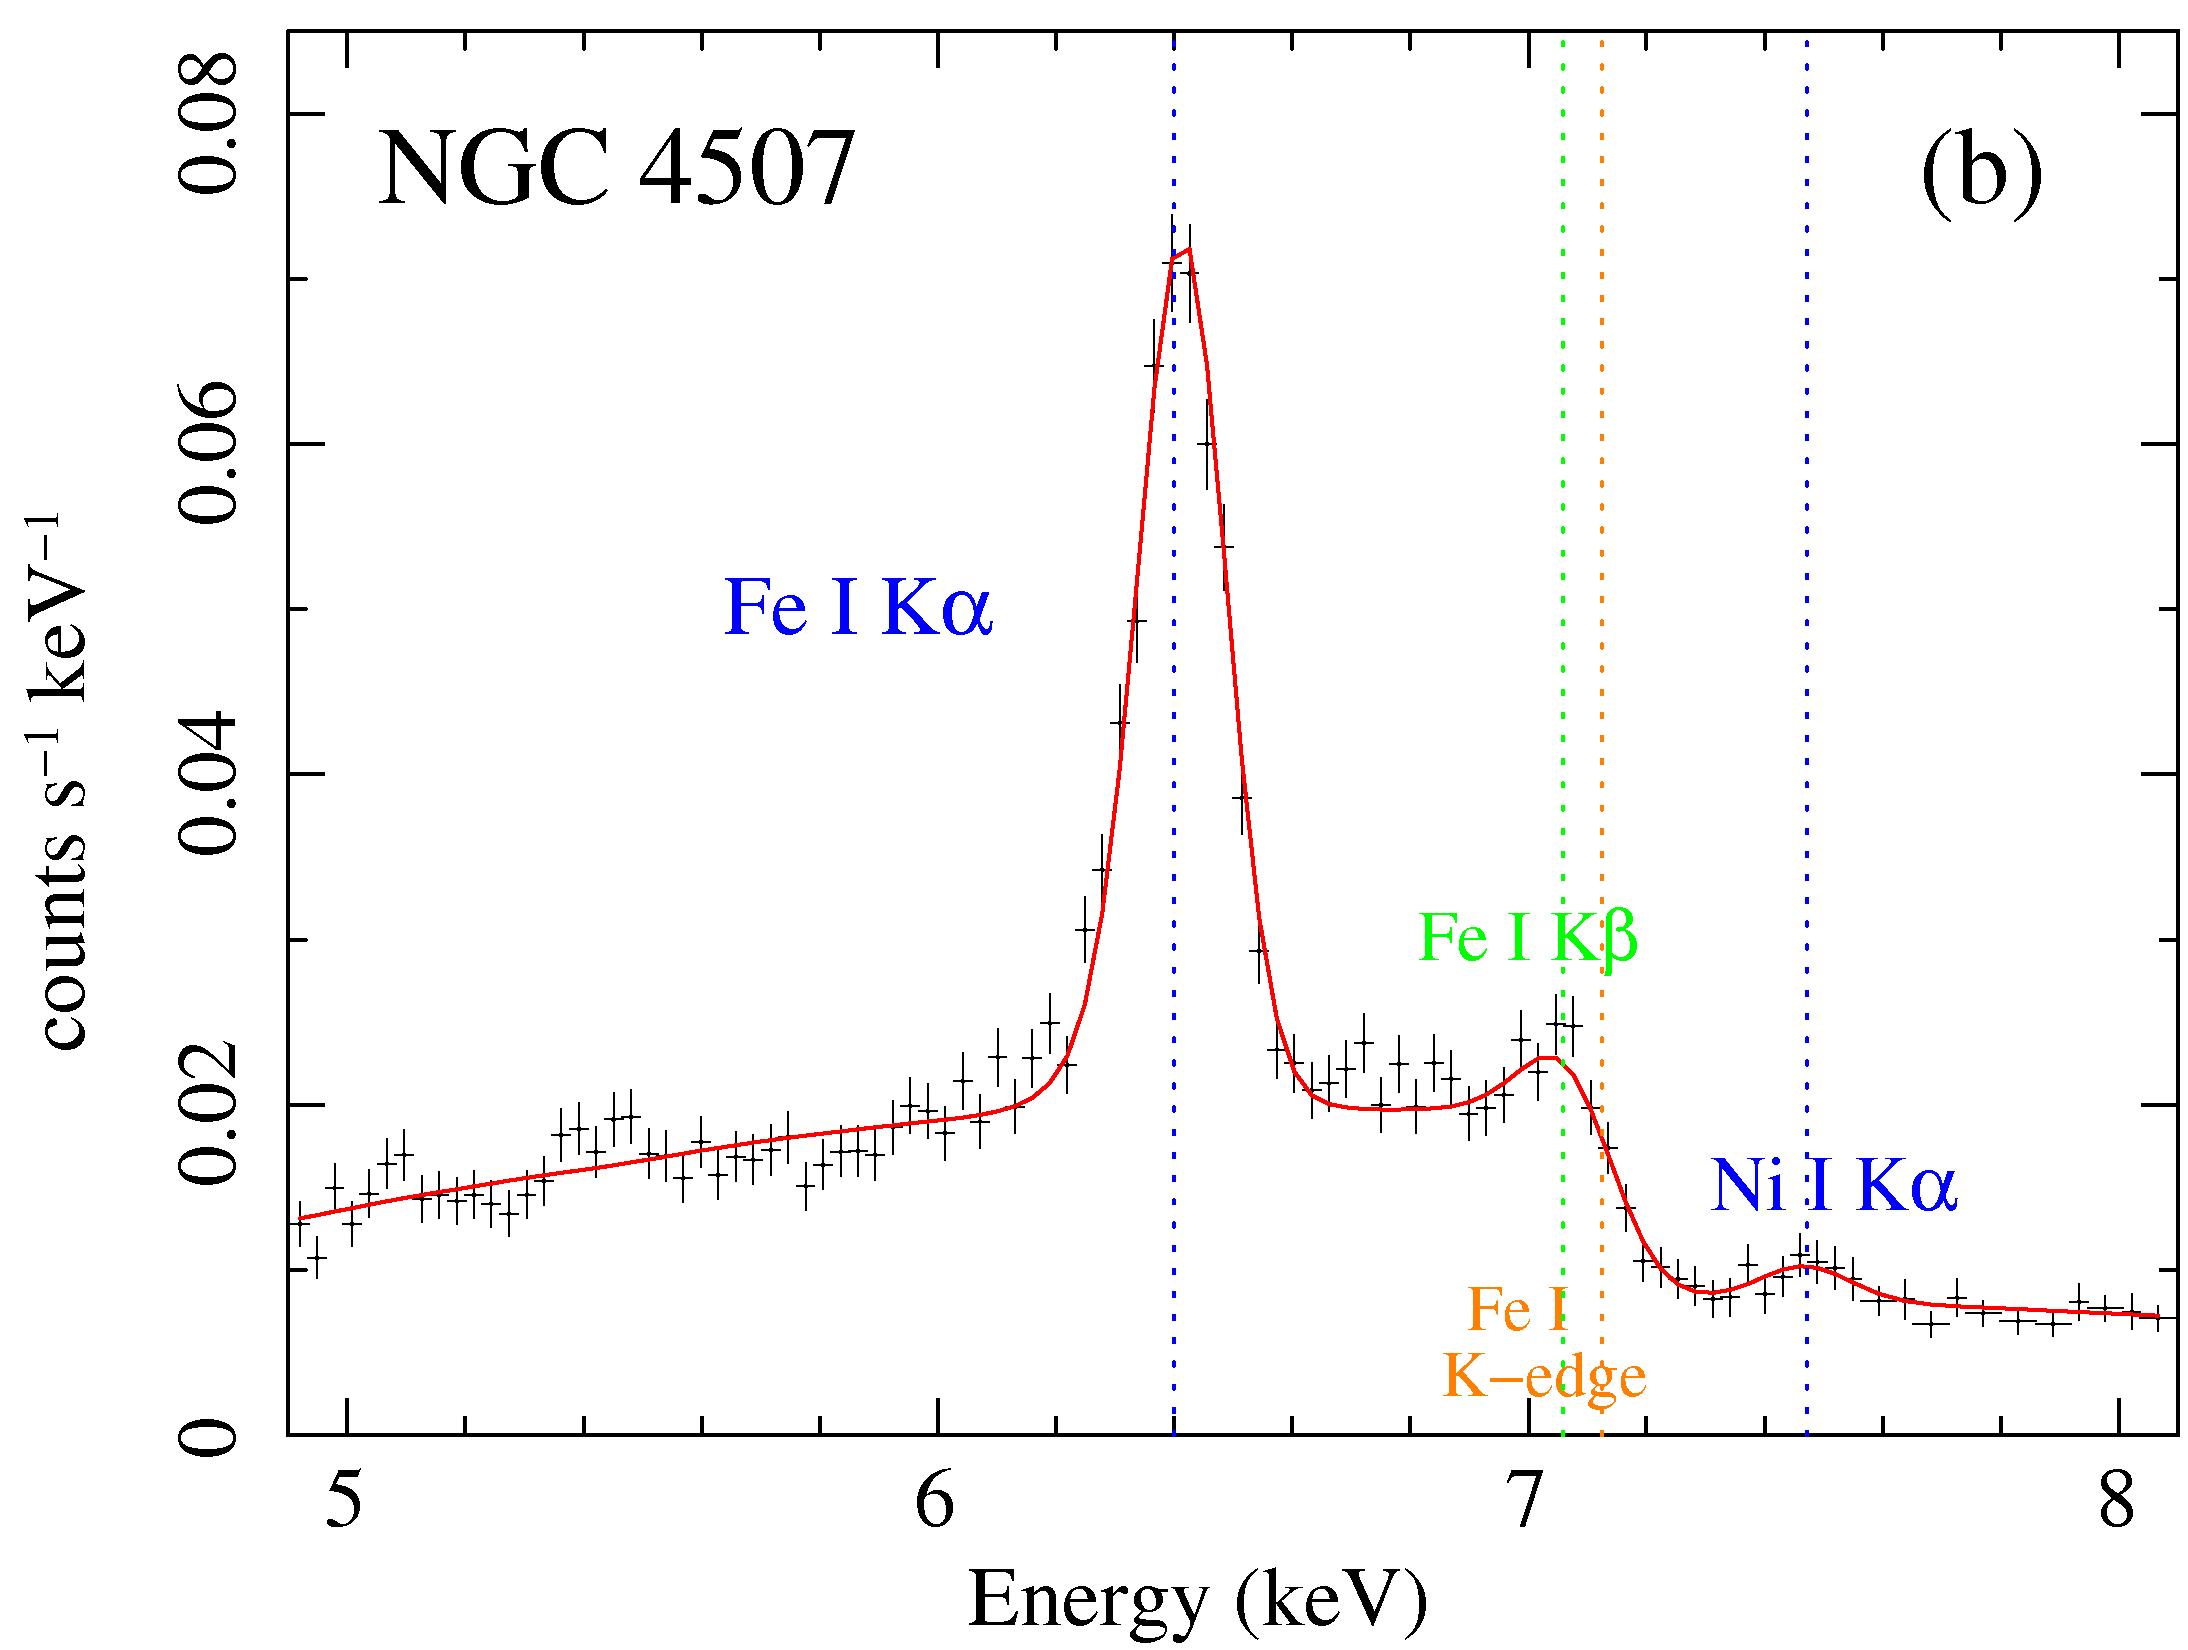 MYTorus fit to NGC 4507 Suzaku data: Fe K alpha line region